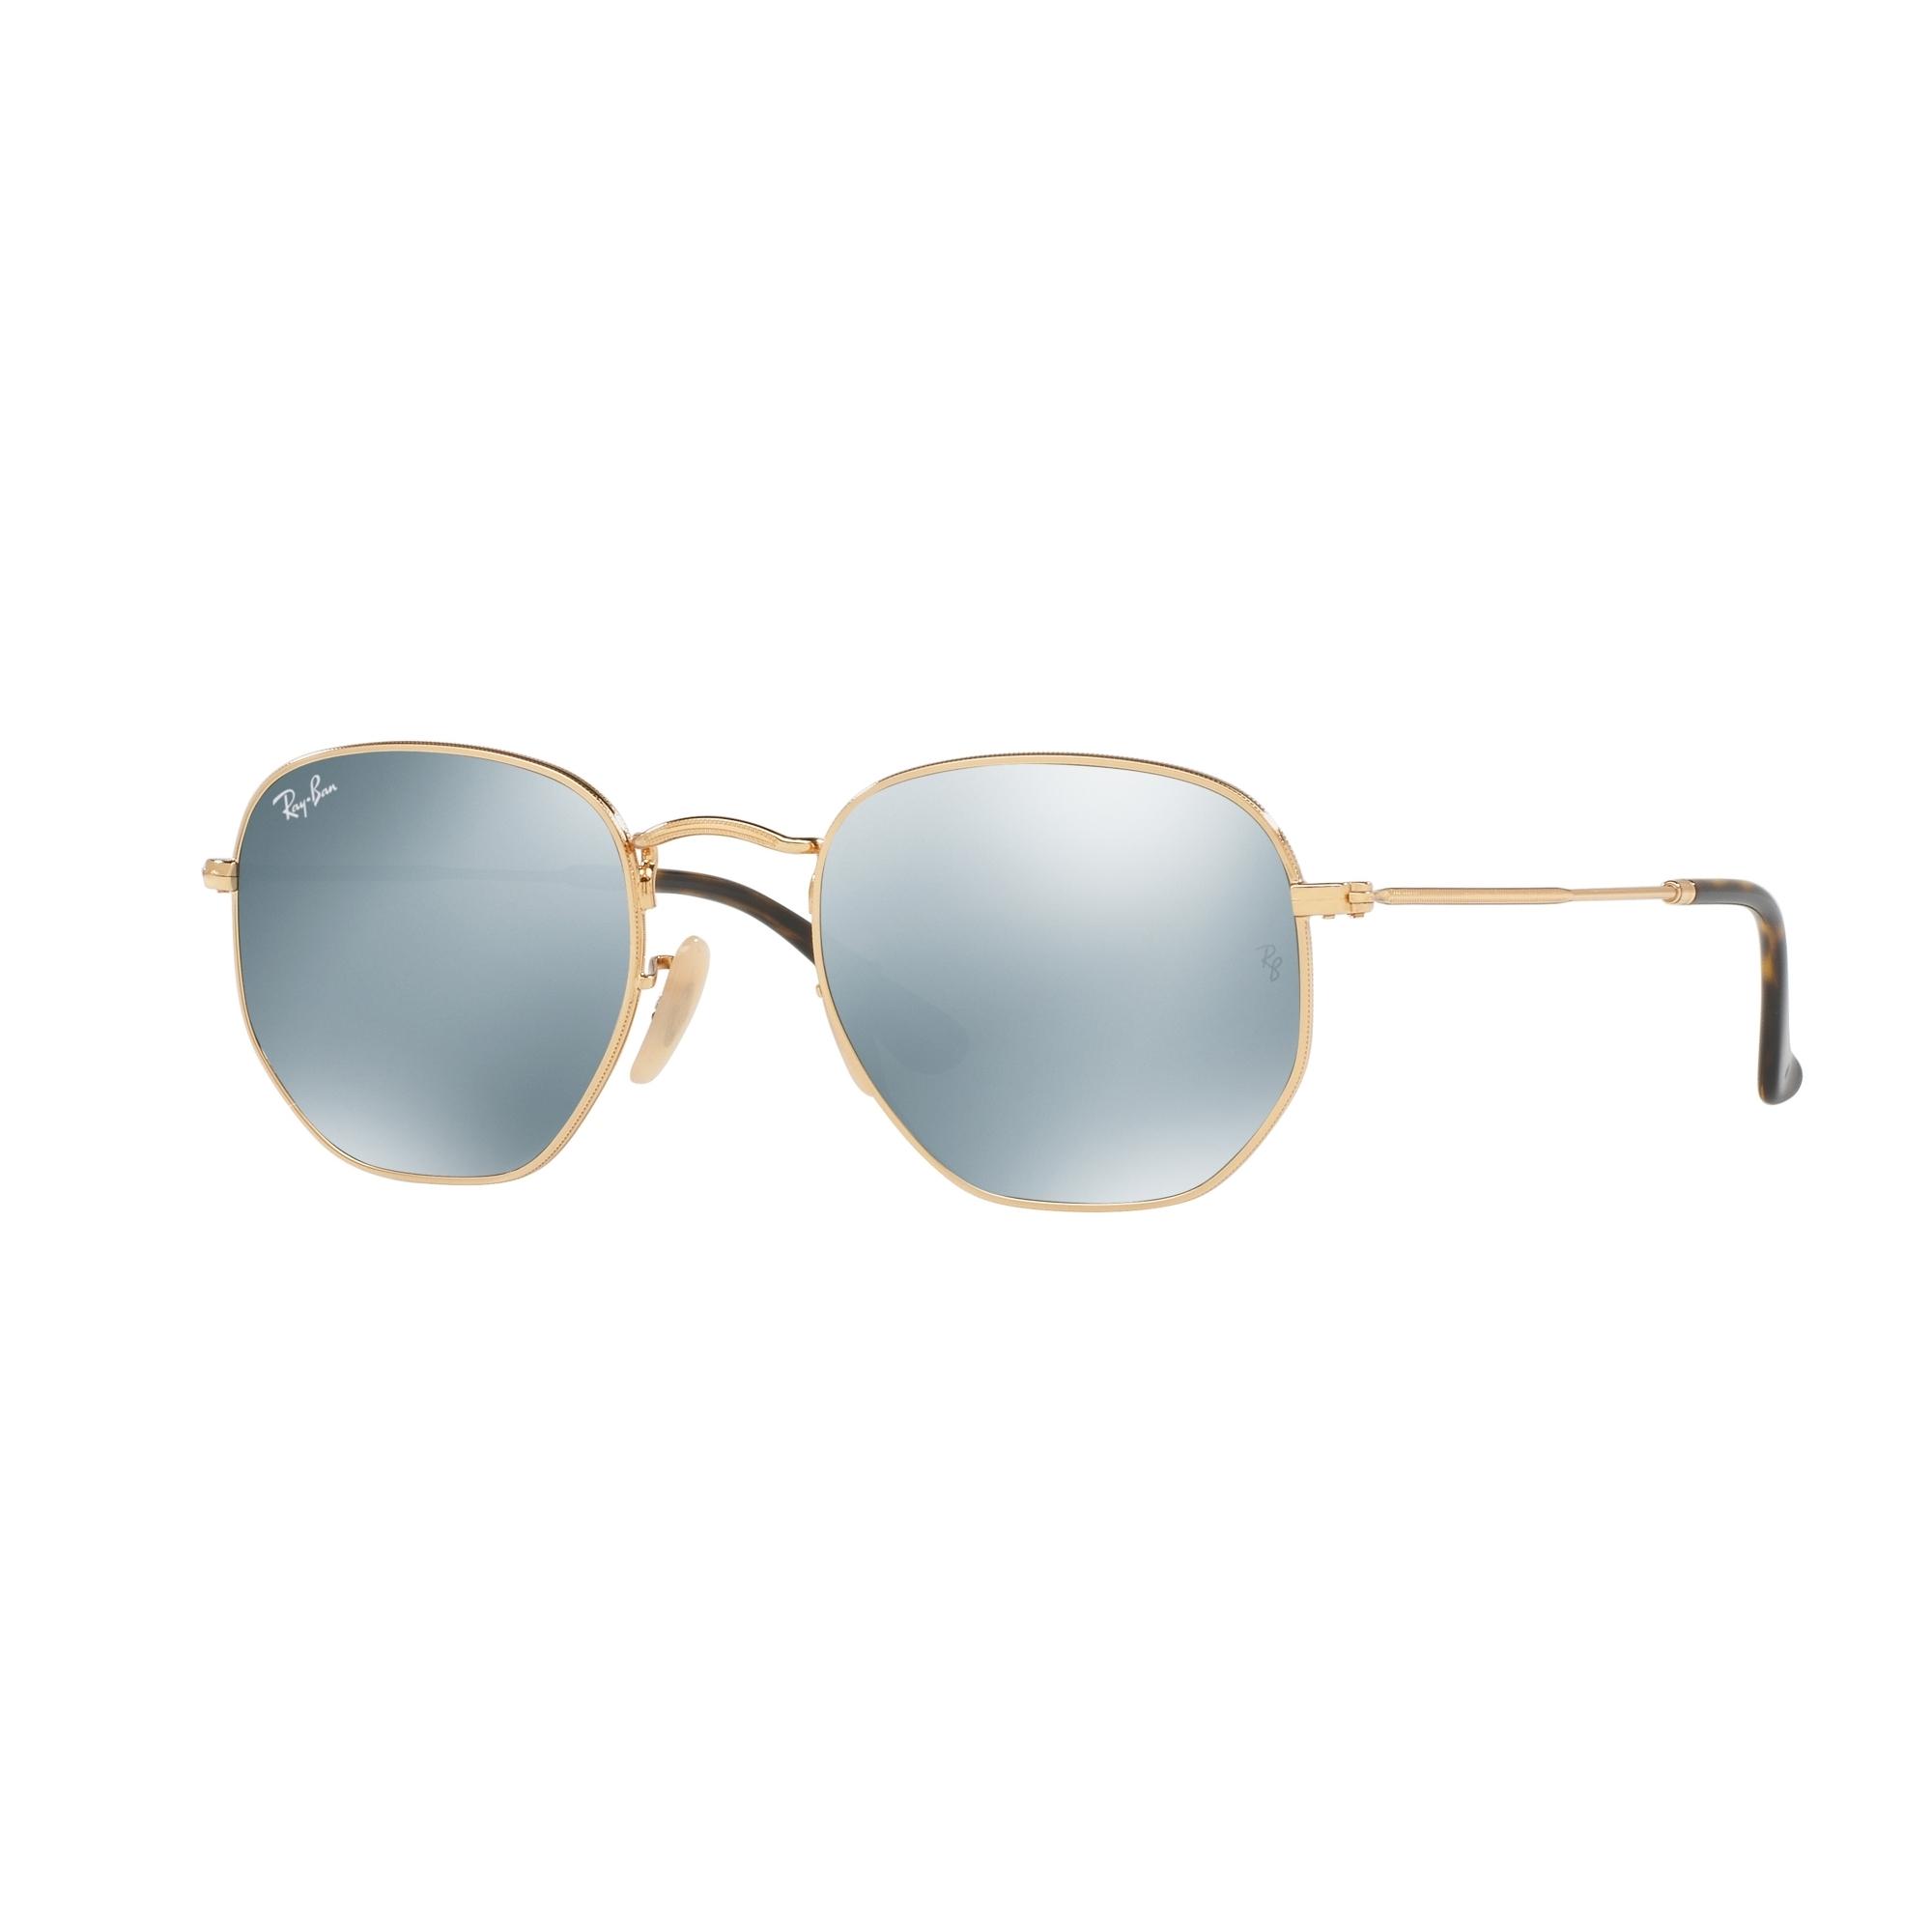 9a97ffee6079b Mens Ray-Ban Gold Plated Hexagonal Flat Lens Sunglasses RB3548N-001 30-51 -  WATCH SHOP.™   WatchShop.com™